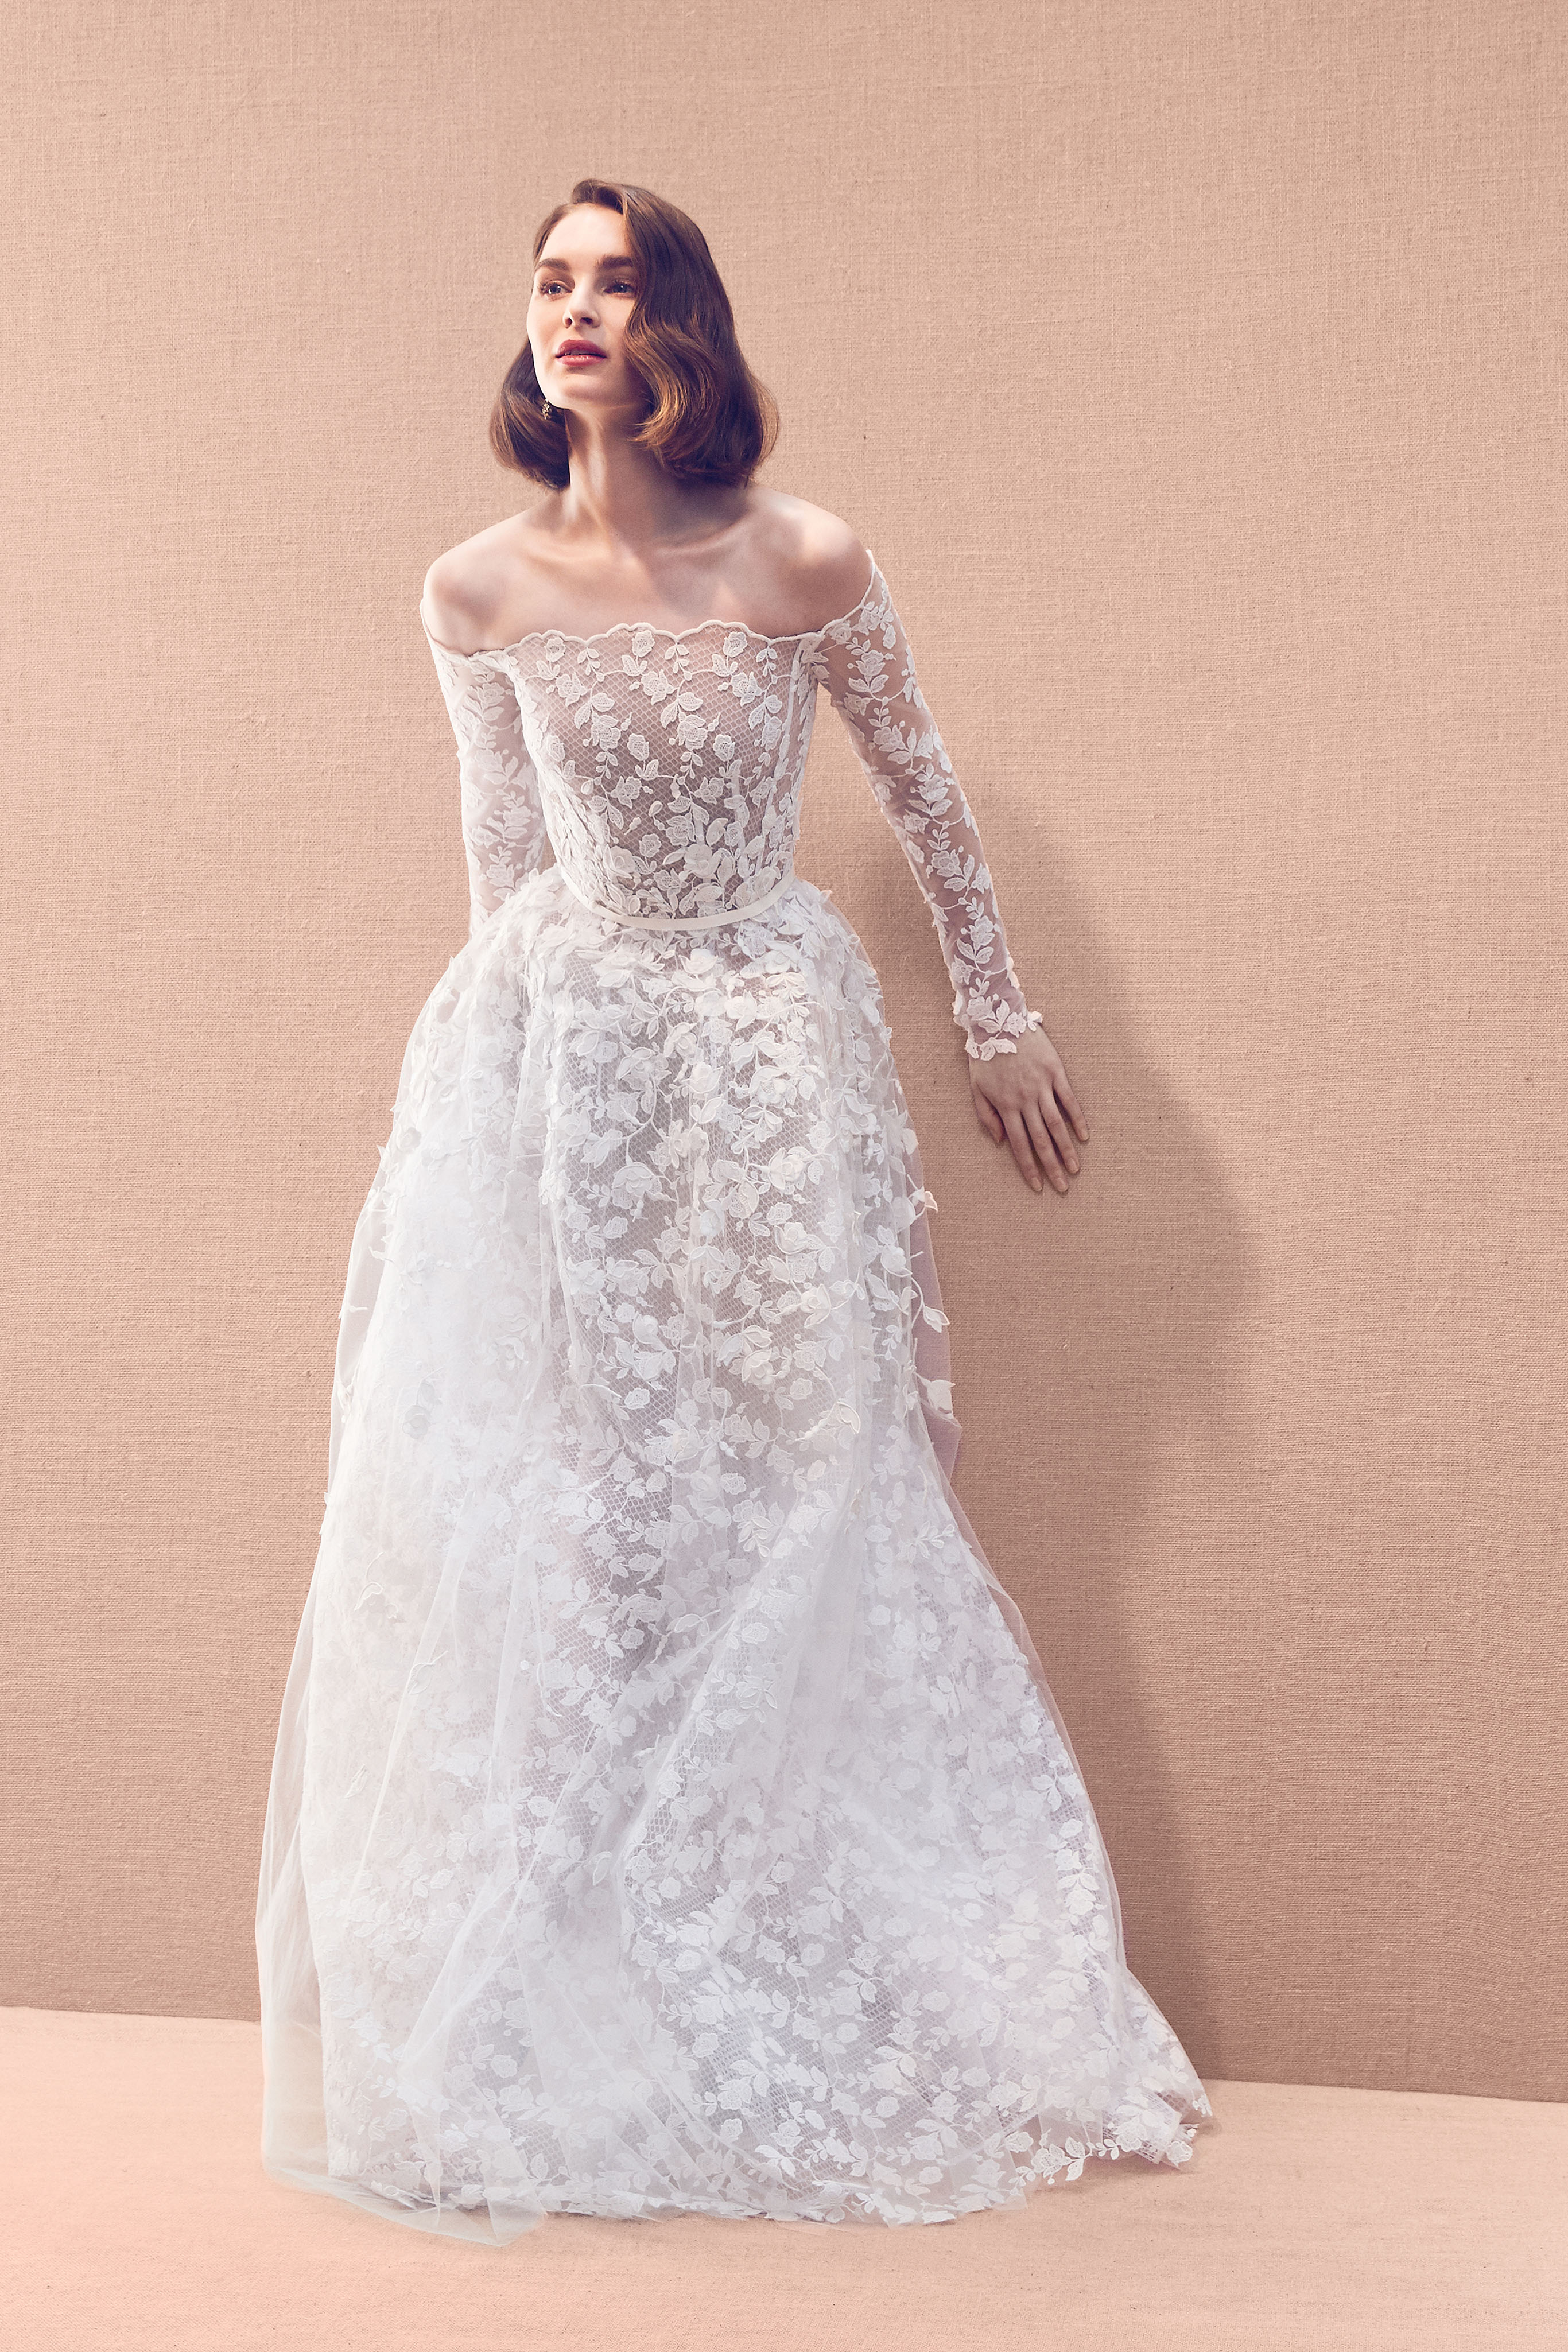 sheer lace scalloped edging off-the-shoulder long sleeve a-line wedding dress Oscar de la Renta Spring 2020